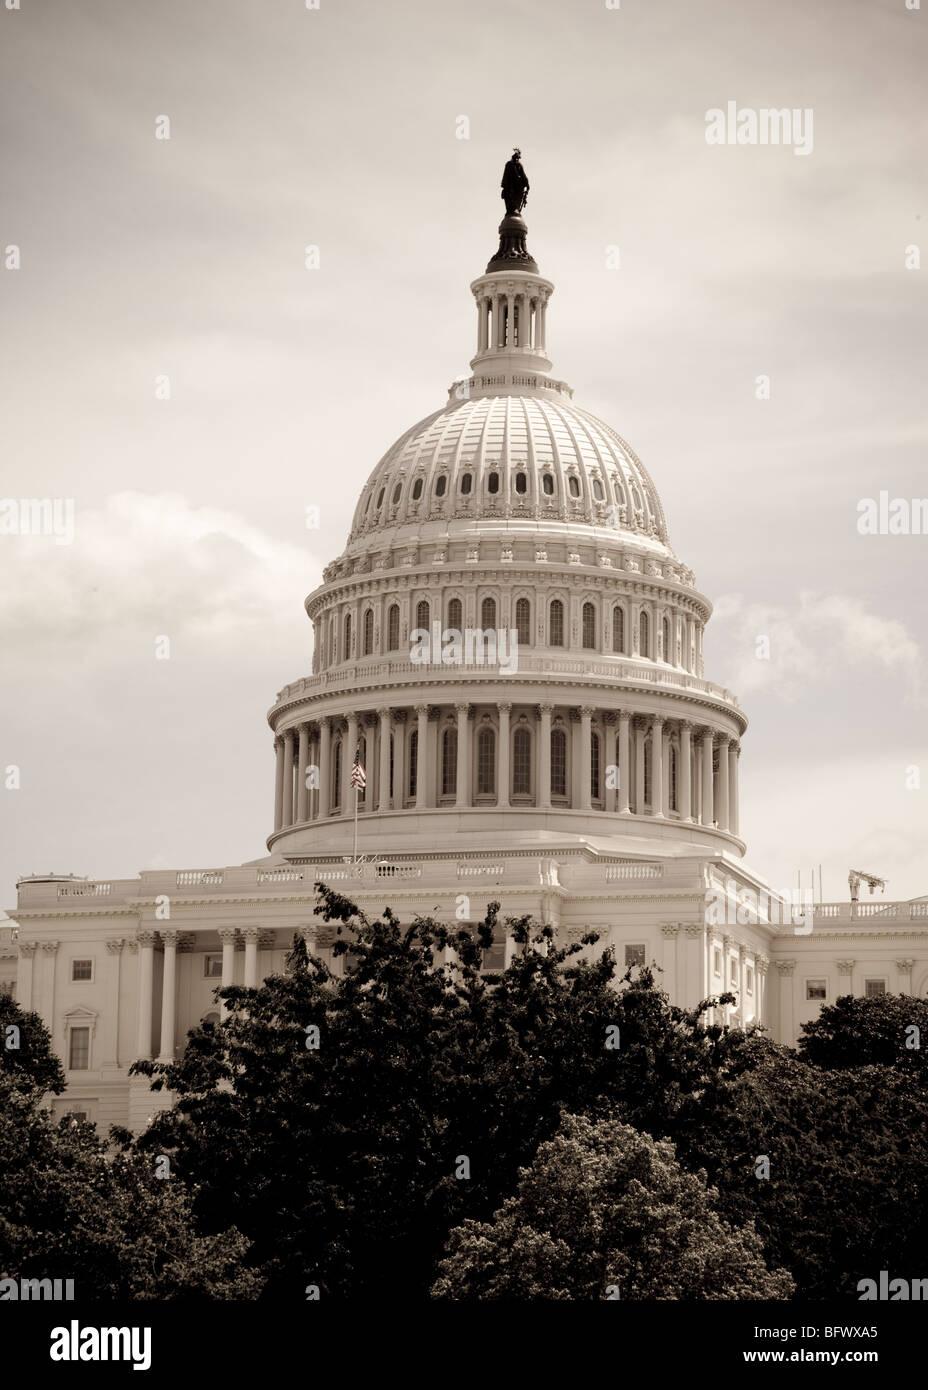 U.S. Capitol - Stock Image